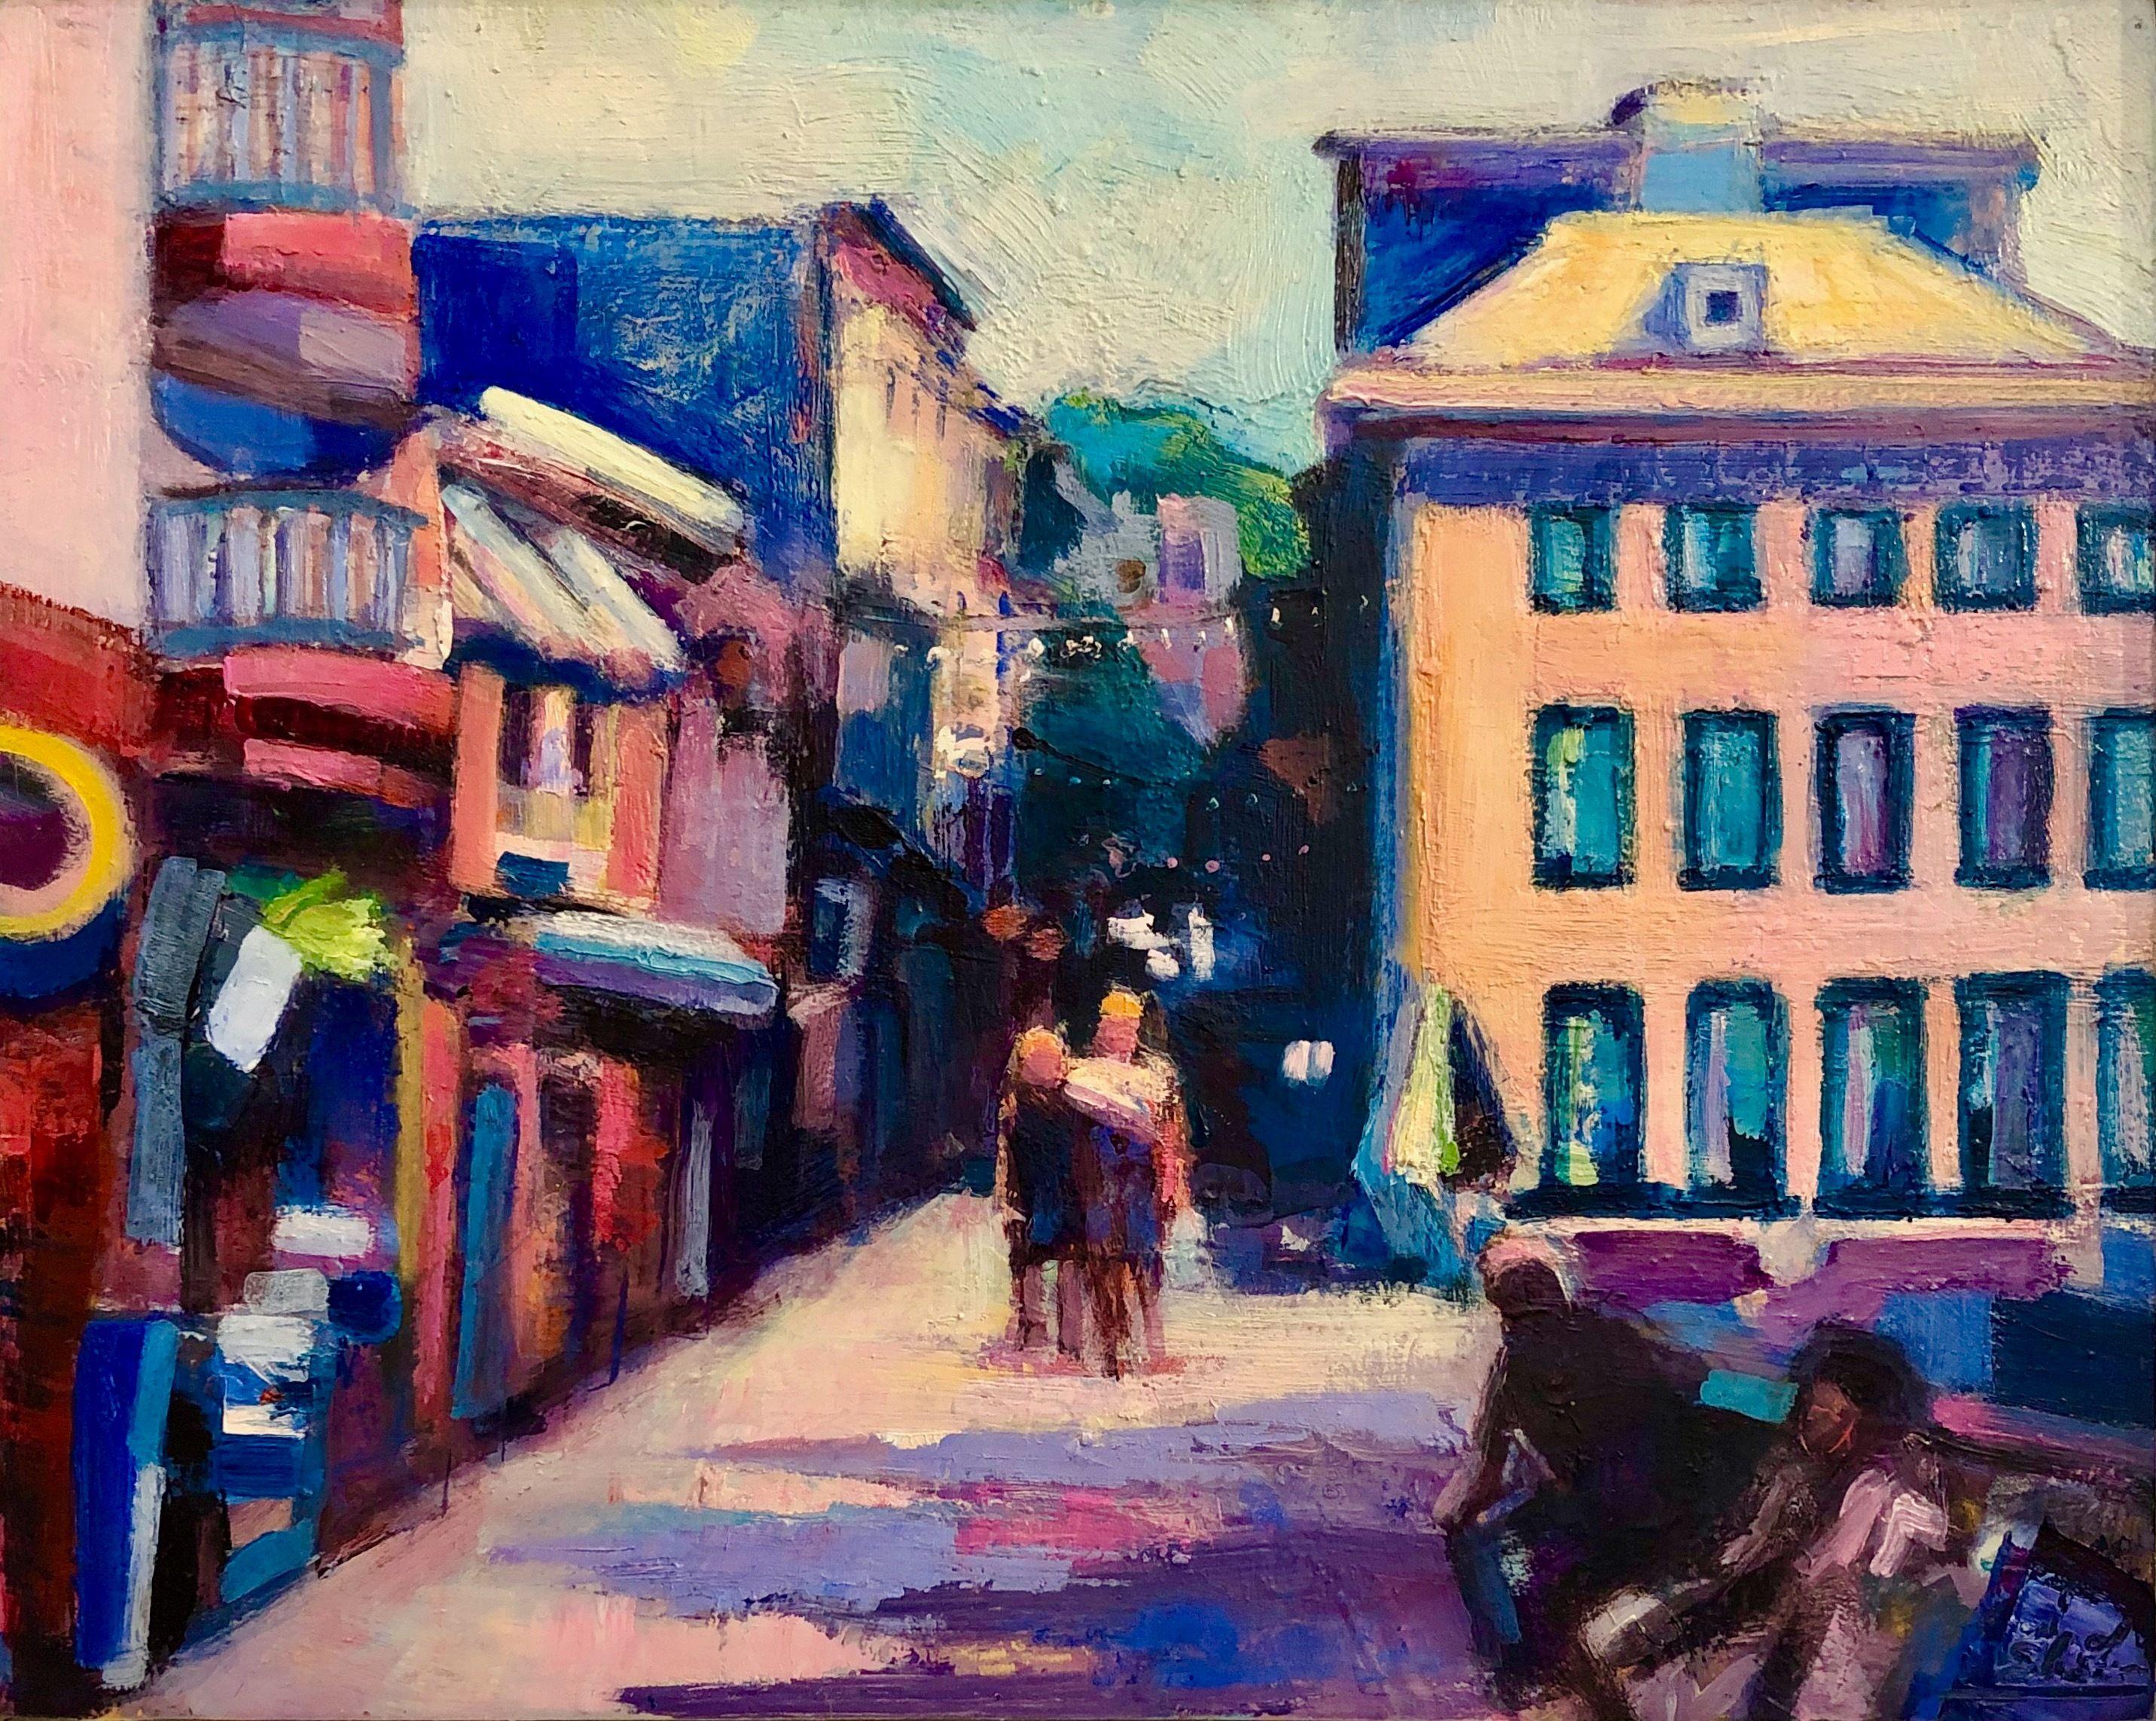 plein air painting by Monique Sarkessian on a trip to